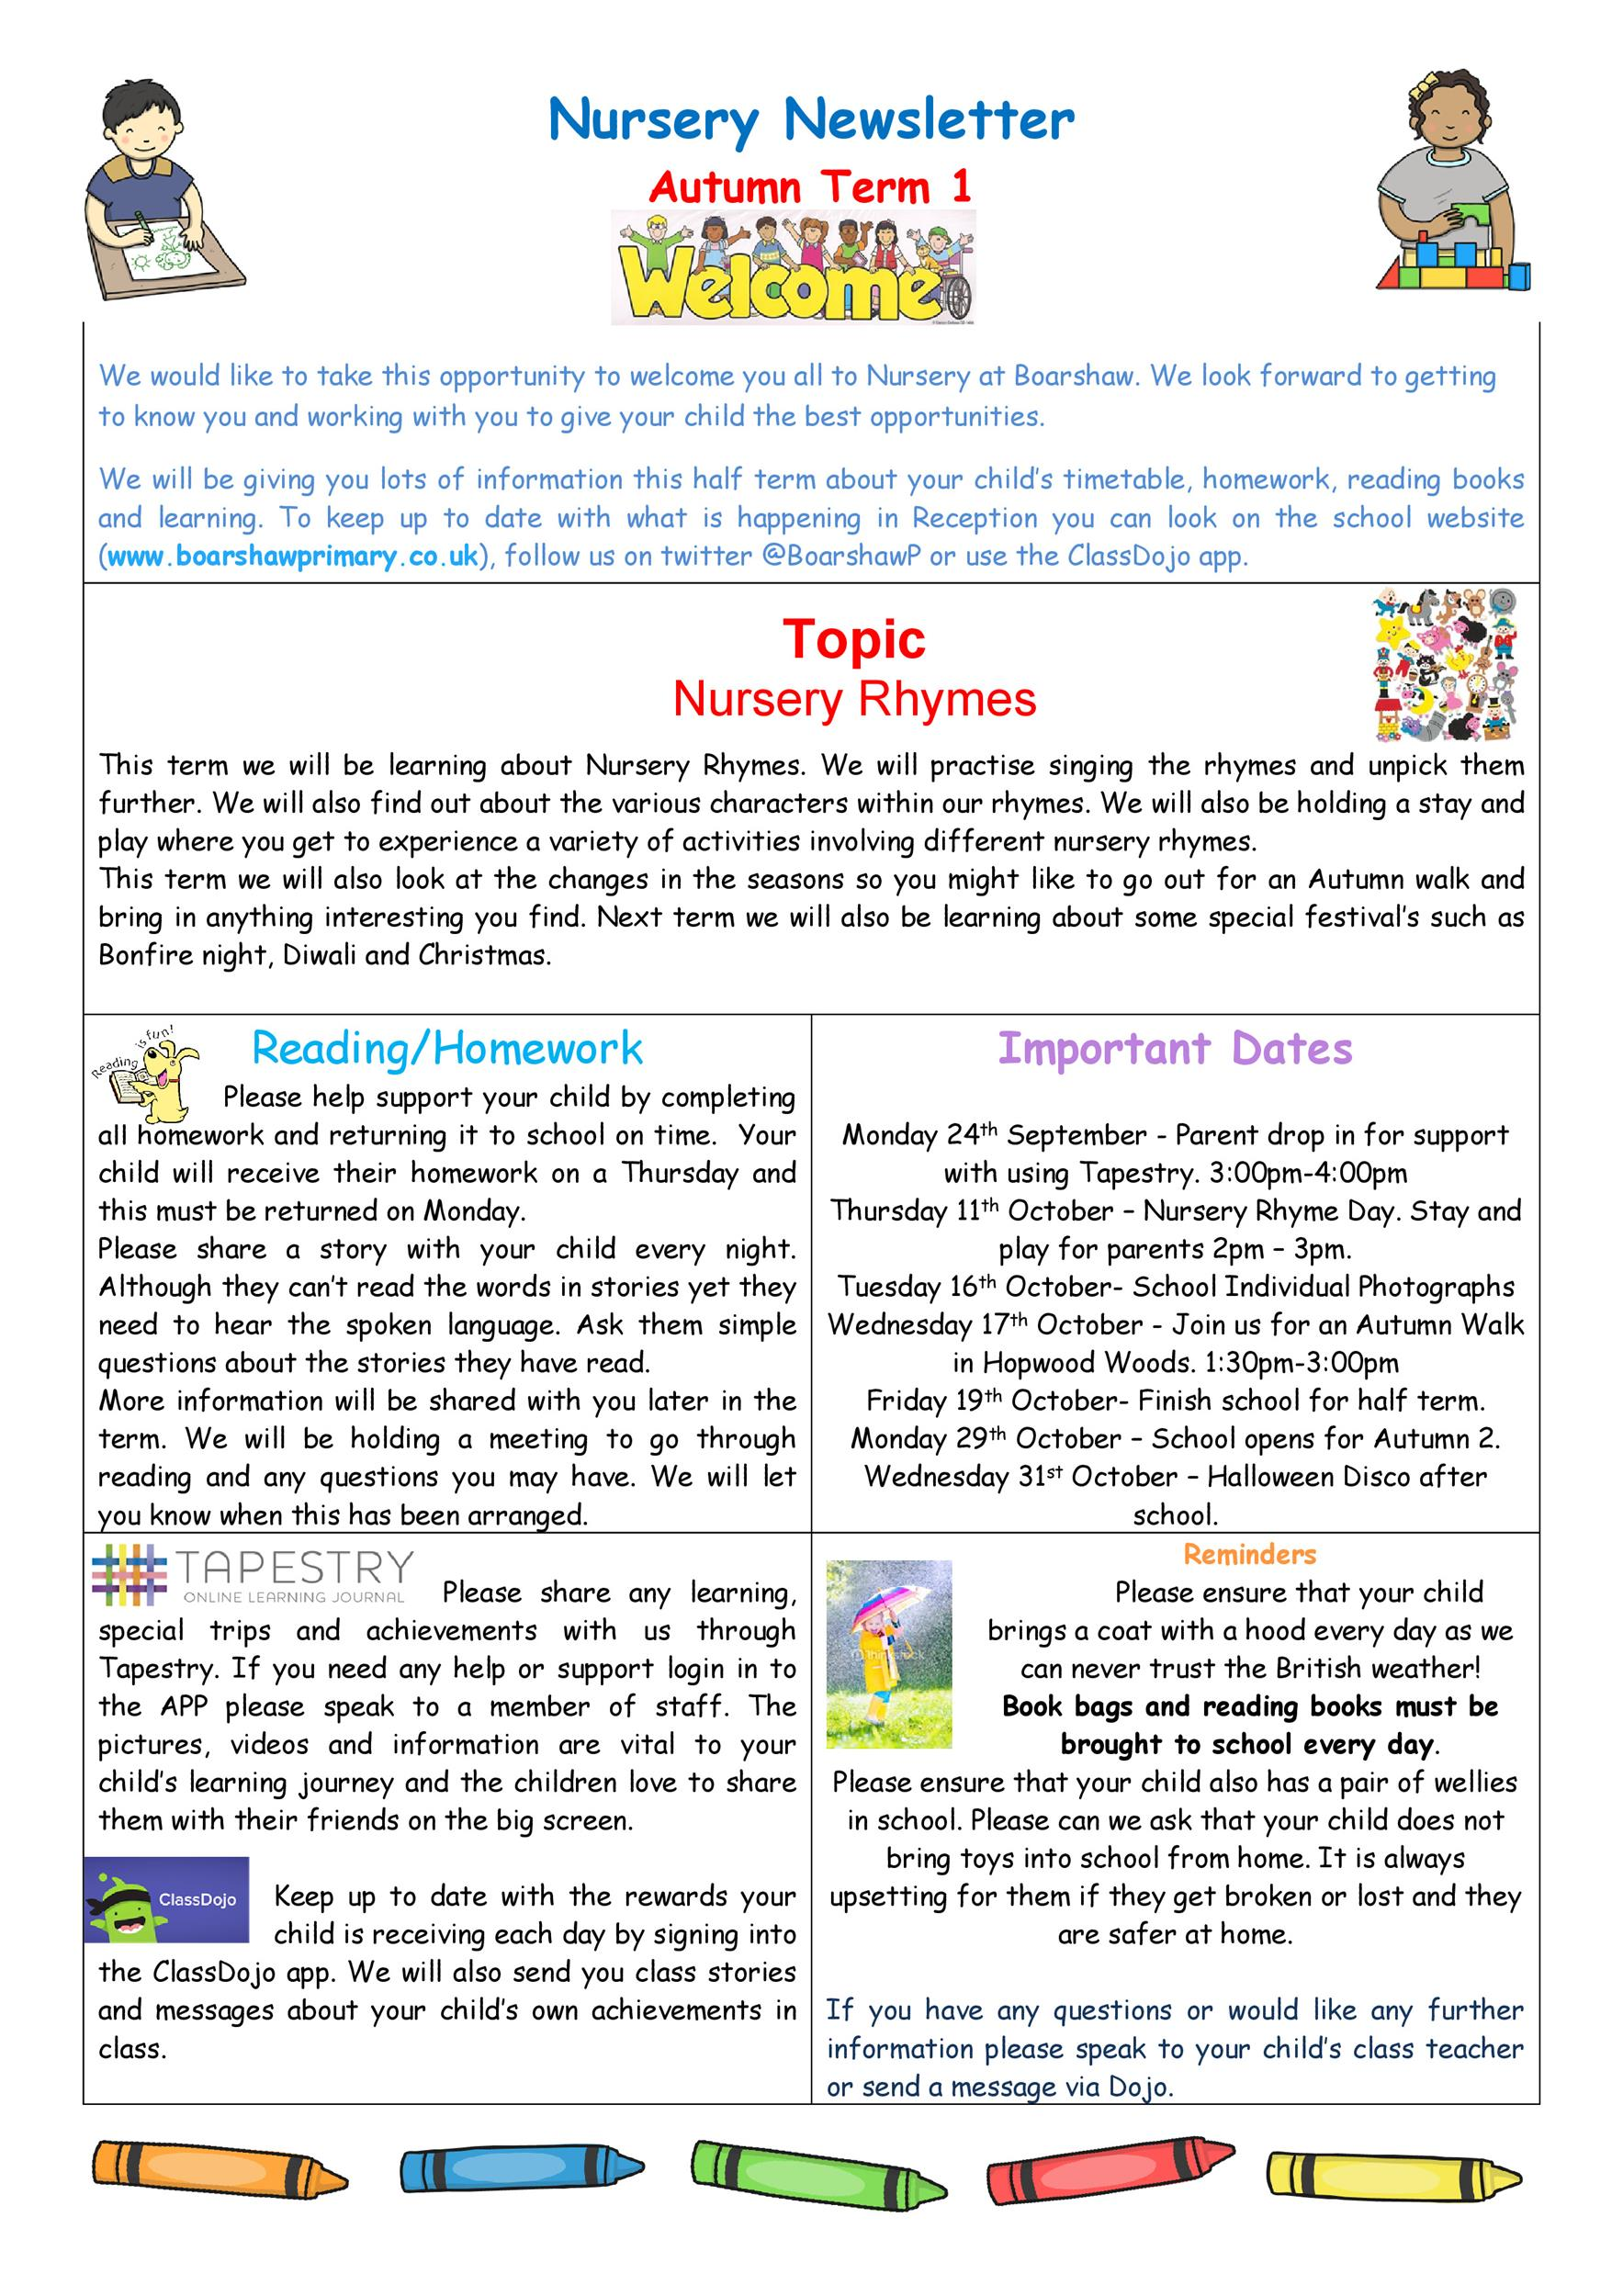 Free preschool newsletter template 06